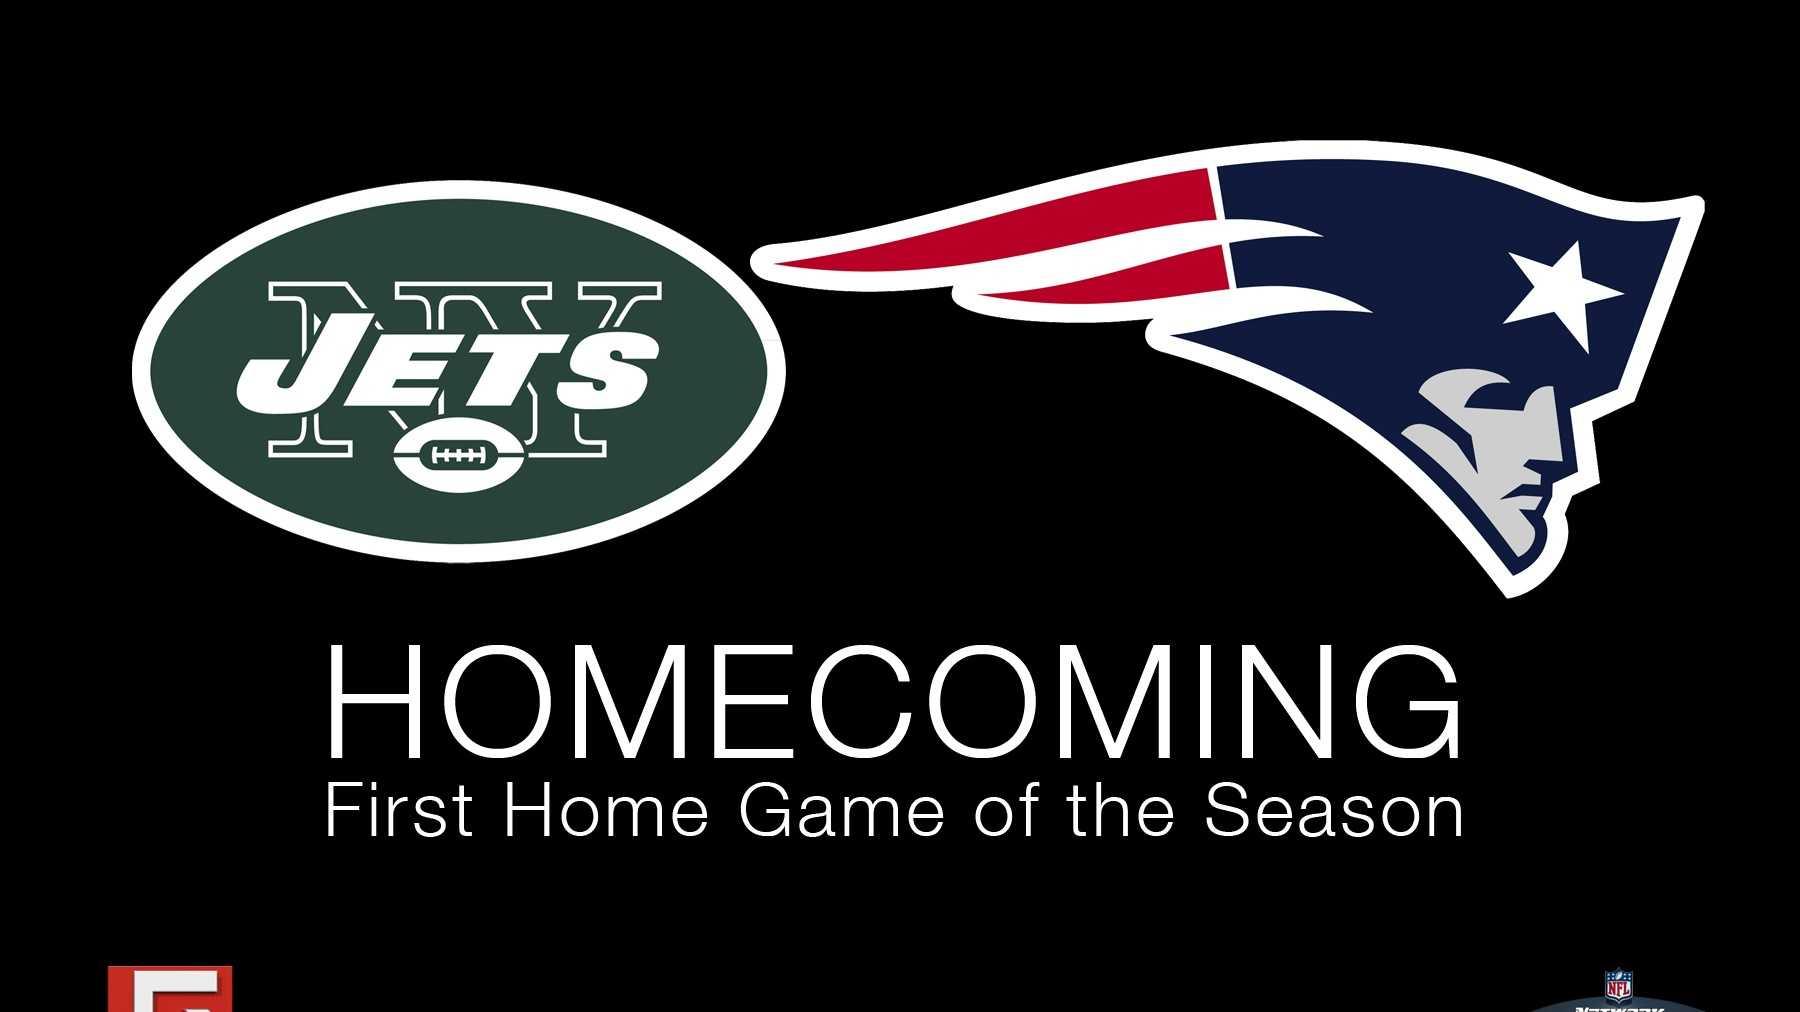 Pats Jets Sept 12 WEB IMAGE TONIGHT.jpg